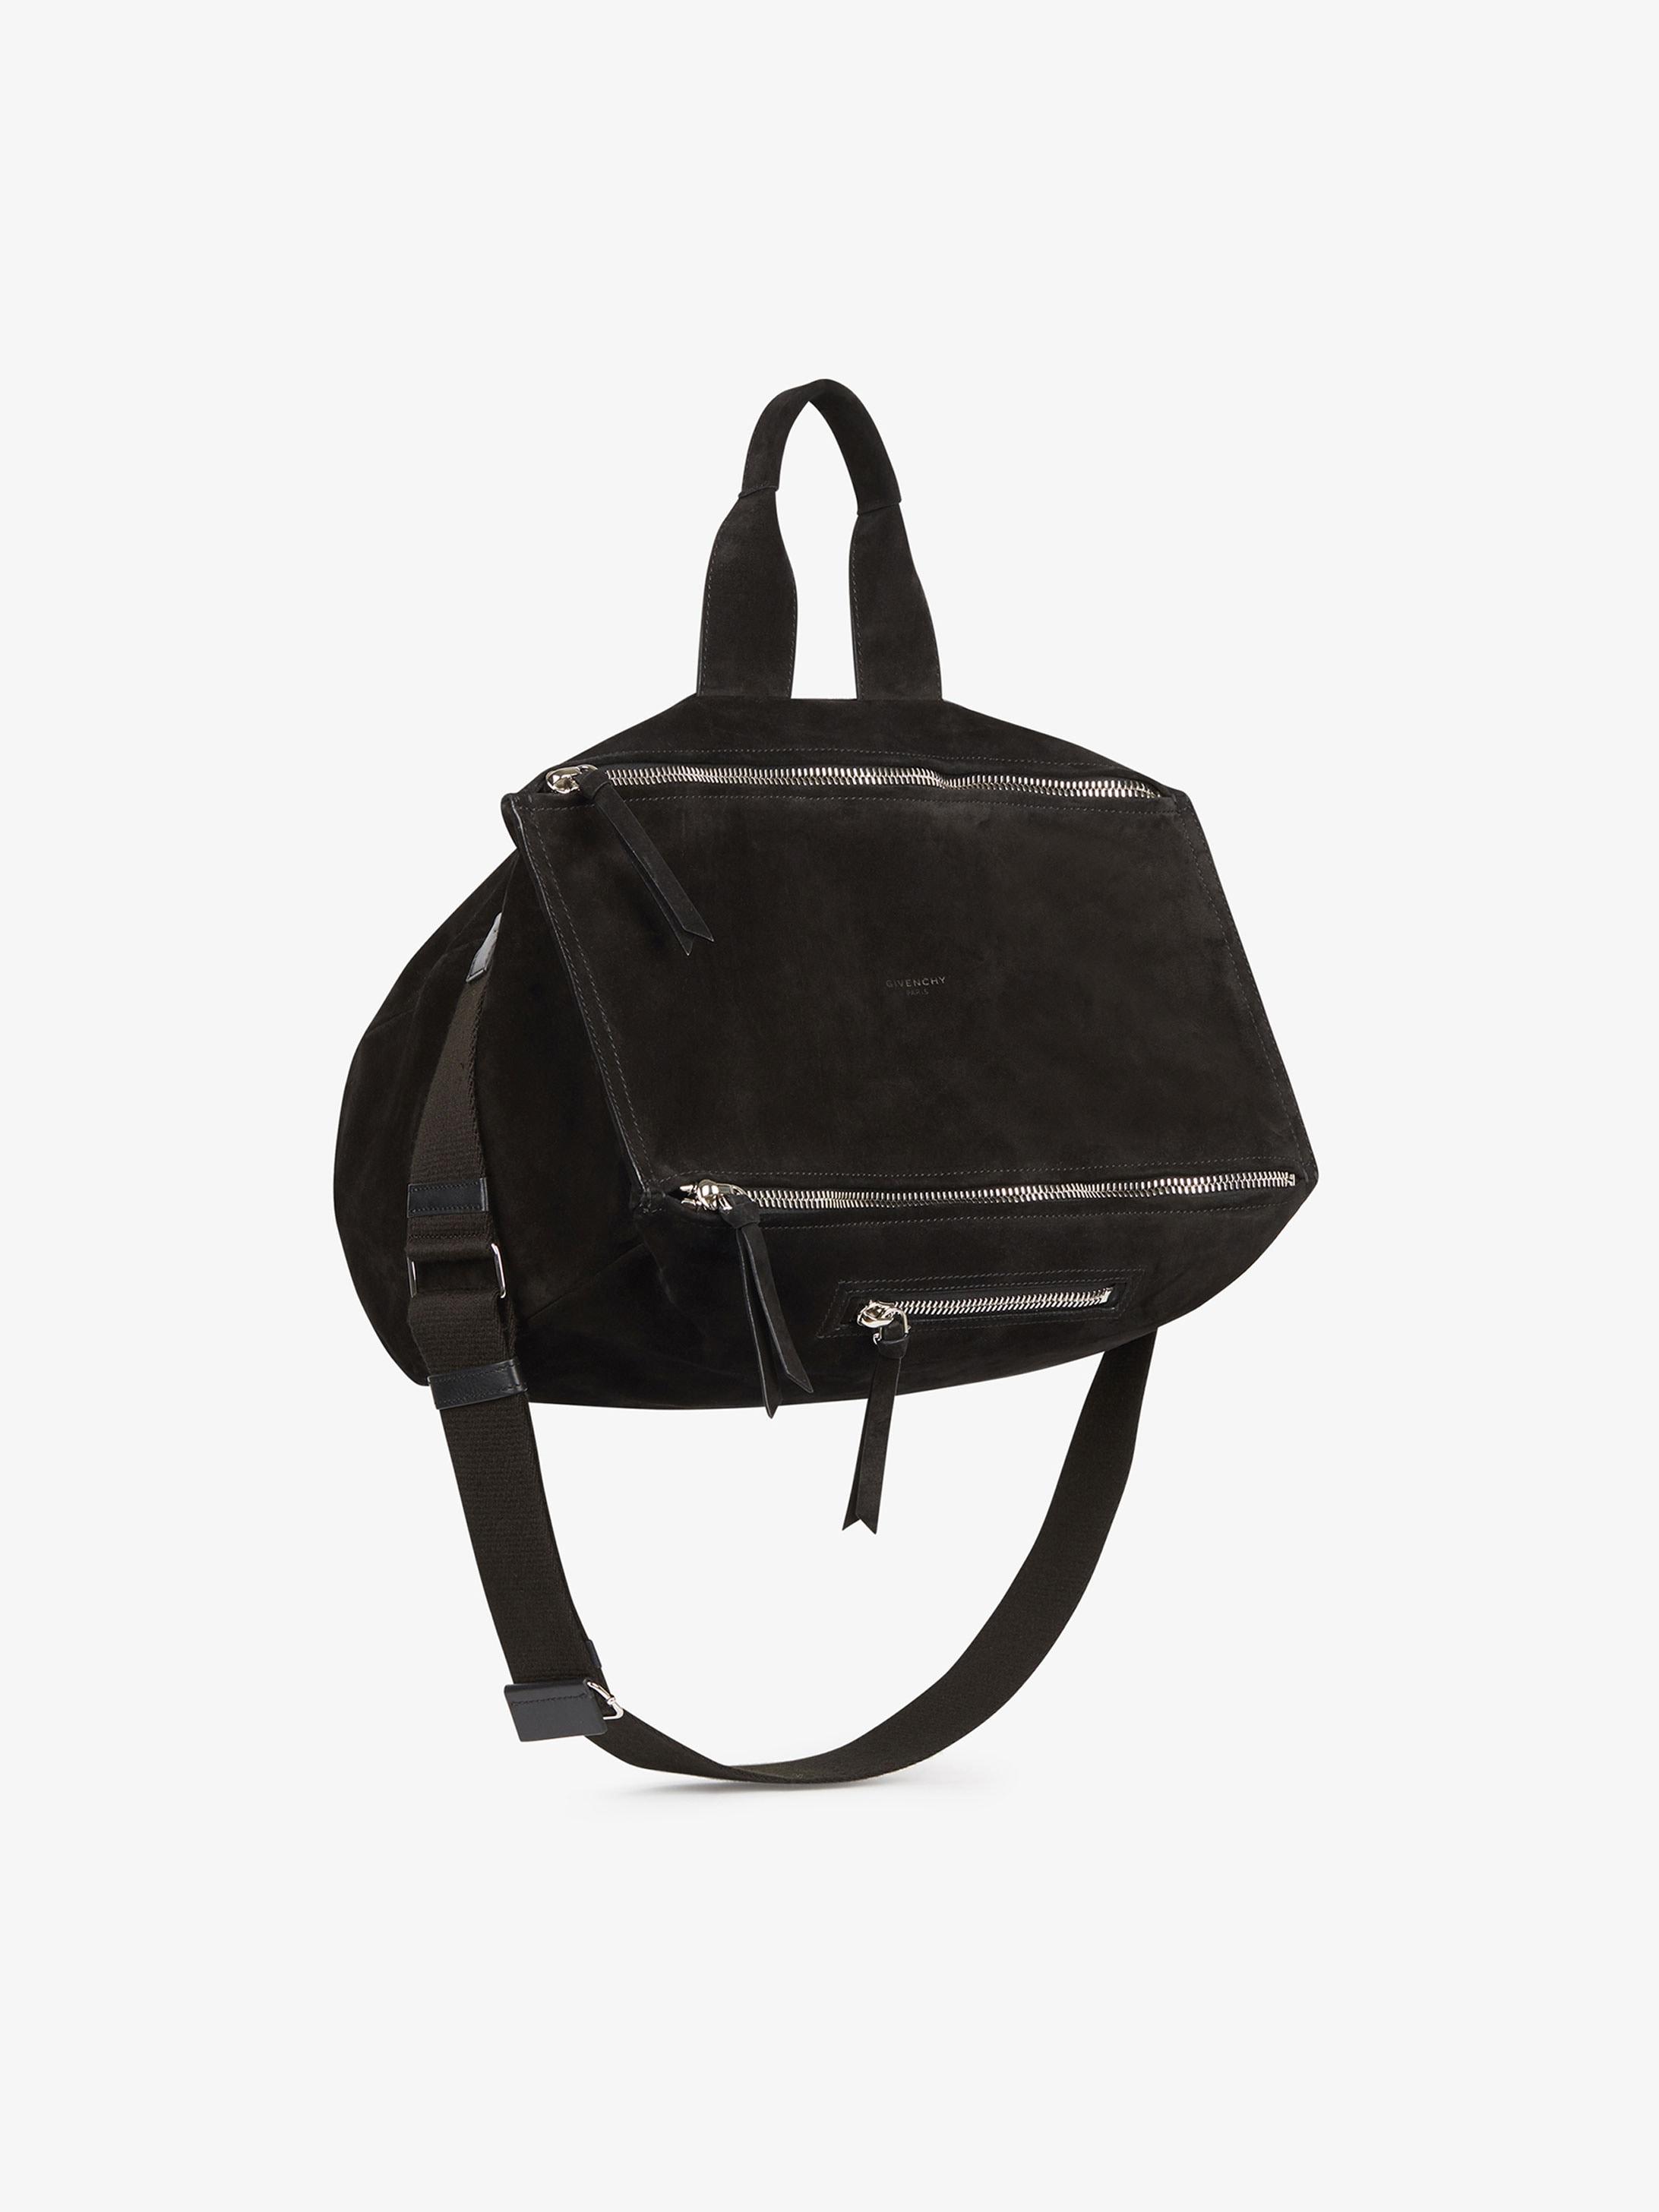 Pandora messenger bag in suede